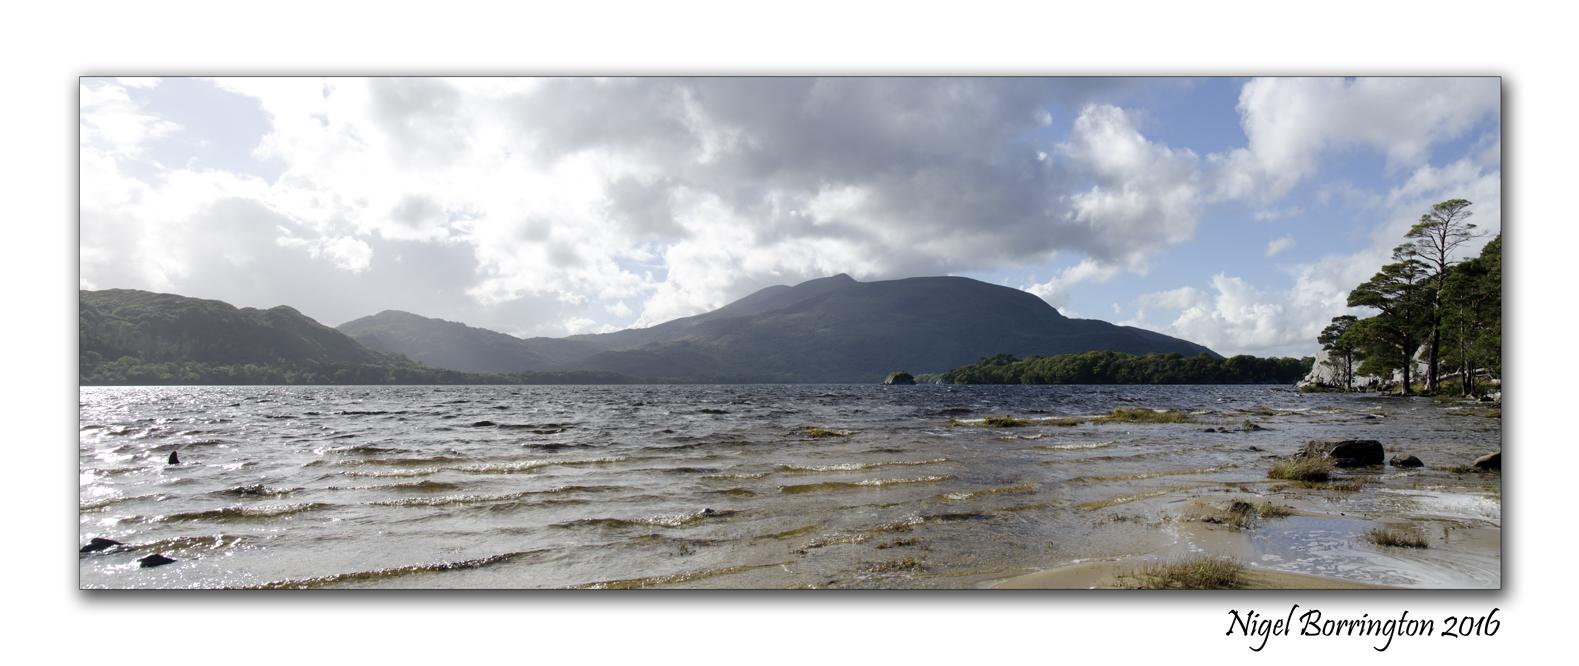 Muckross lake lakes of Killarney Irish landscape Photography Nigel Borrington